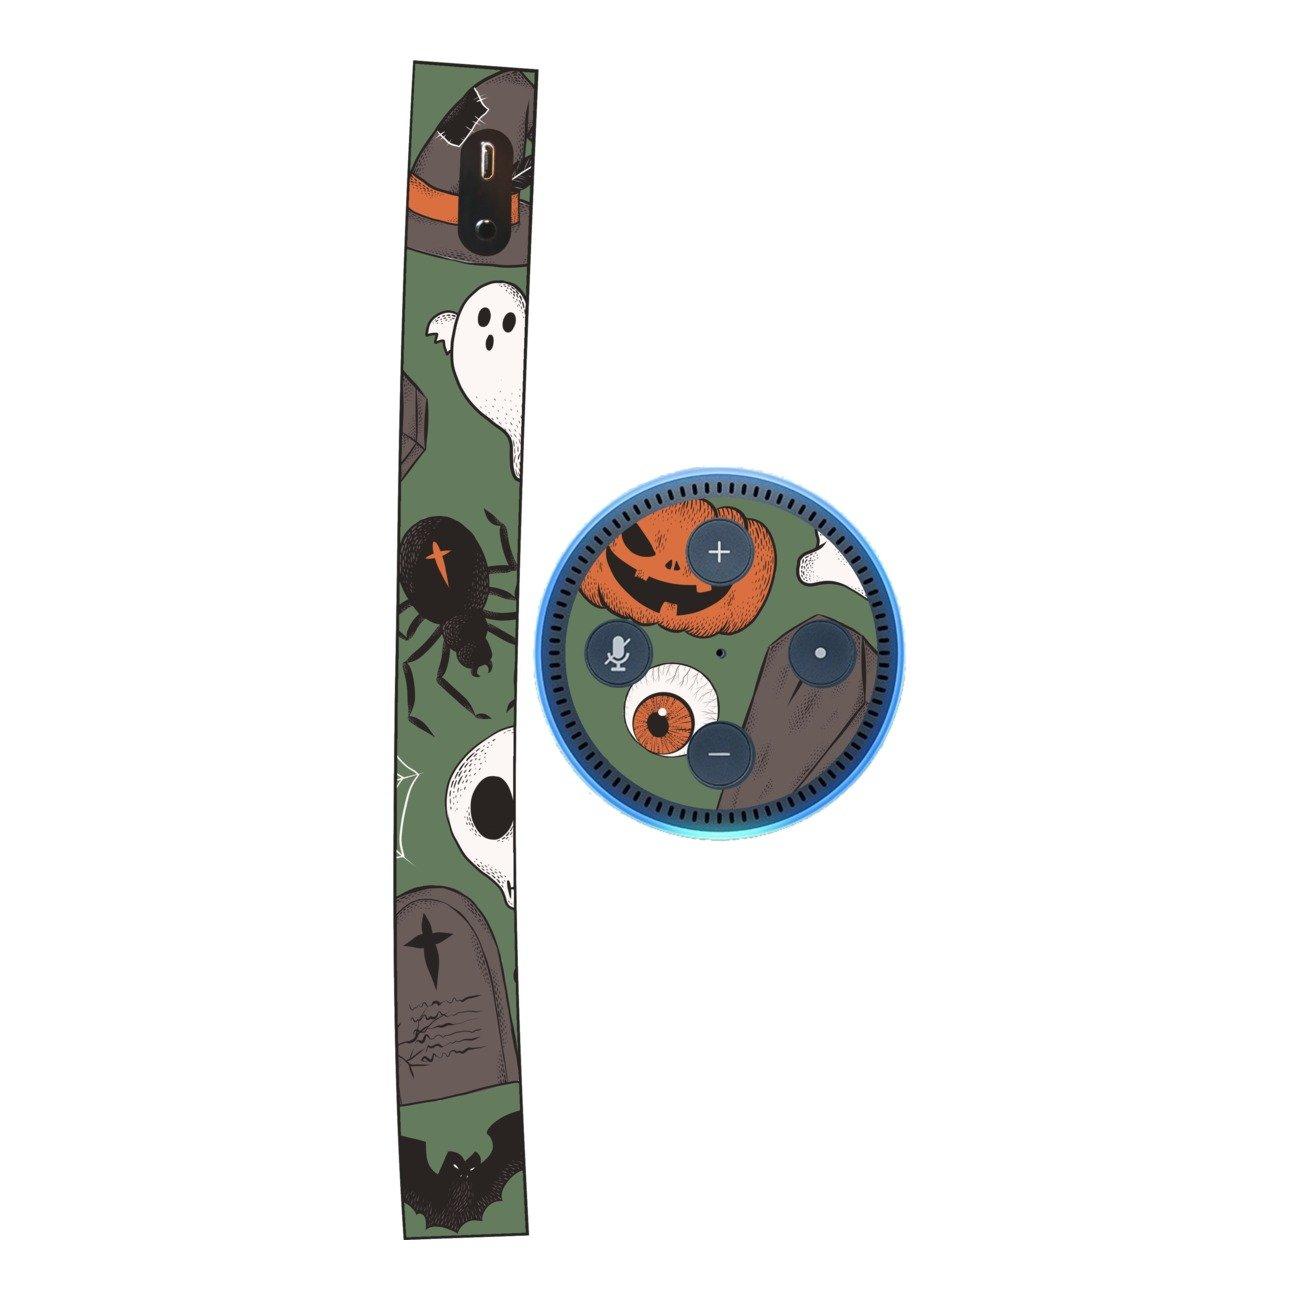 DISAGU SF SDI 5436_ 1211Design Pellicole per  Echo DOT–Motivo Halloween Modello 03' SF-sdi-5436_1211